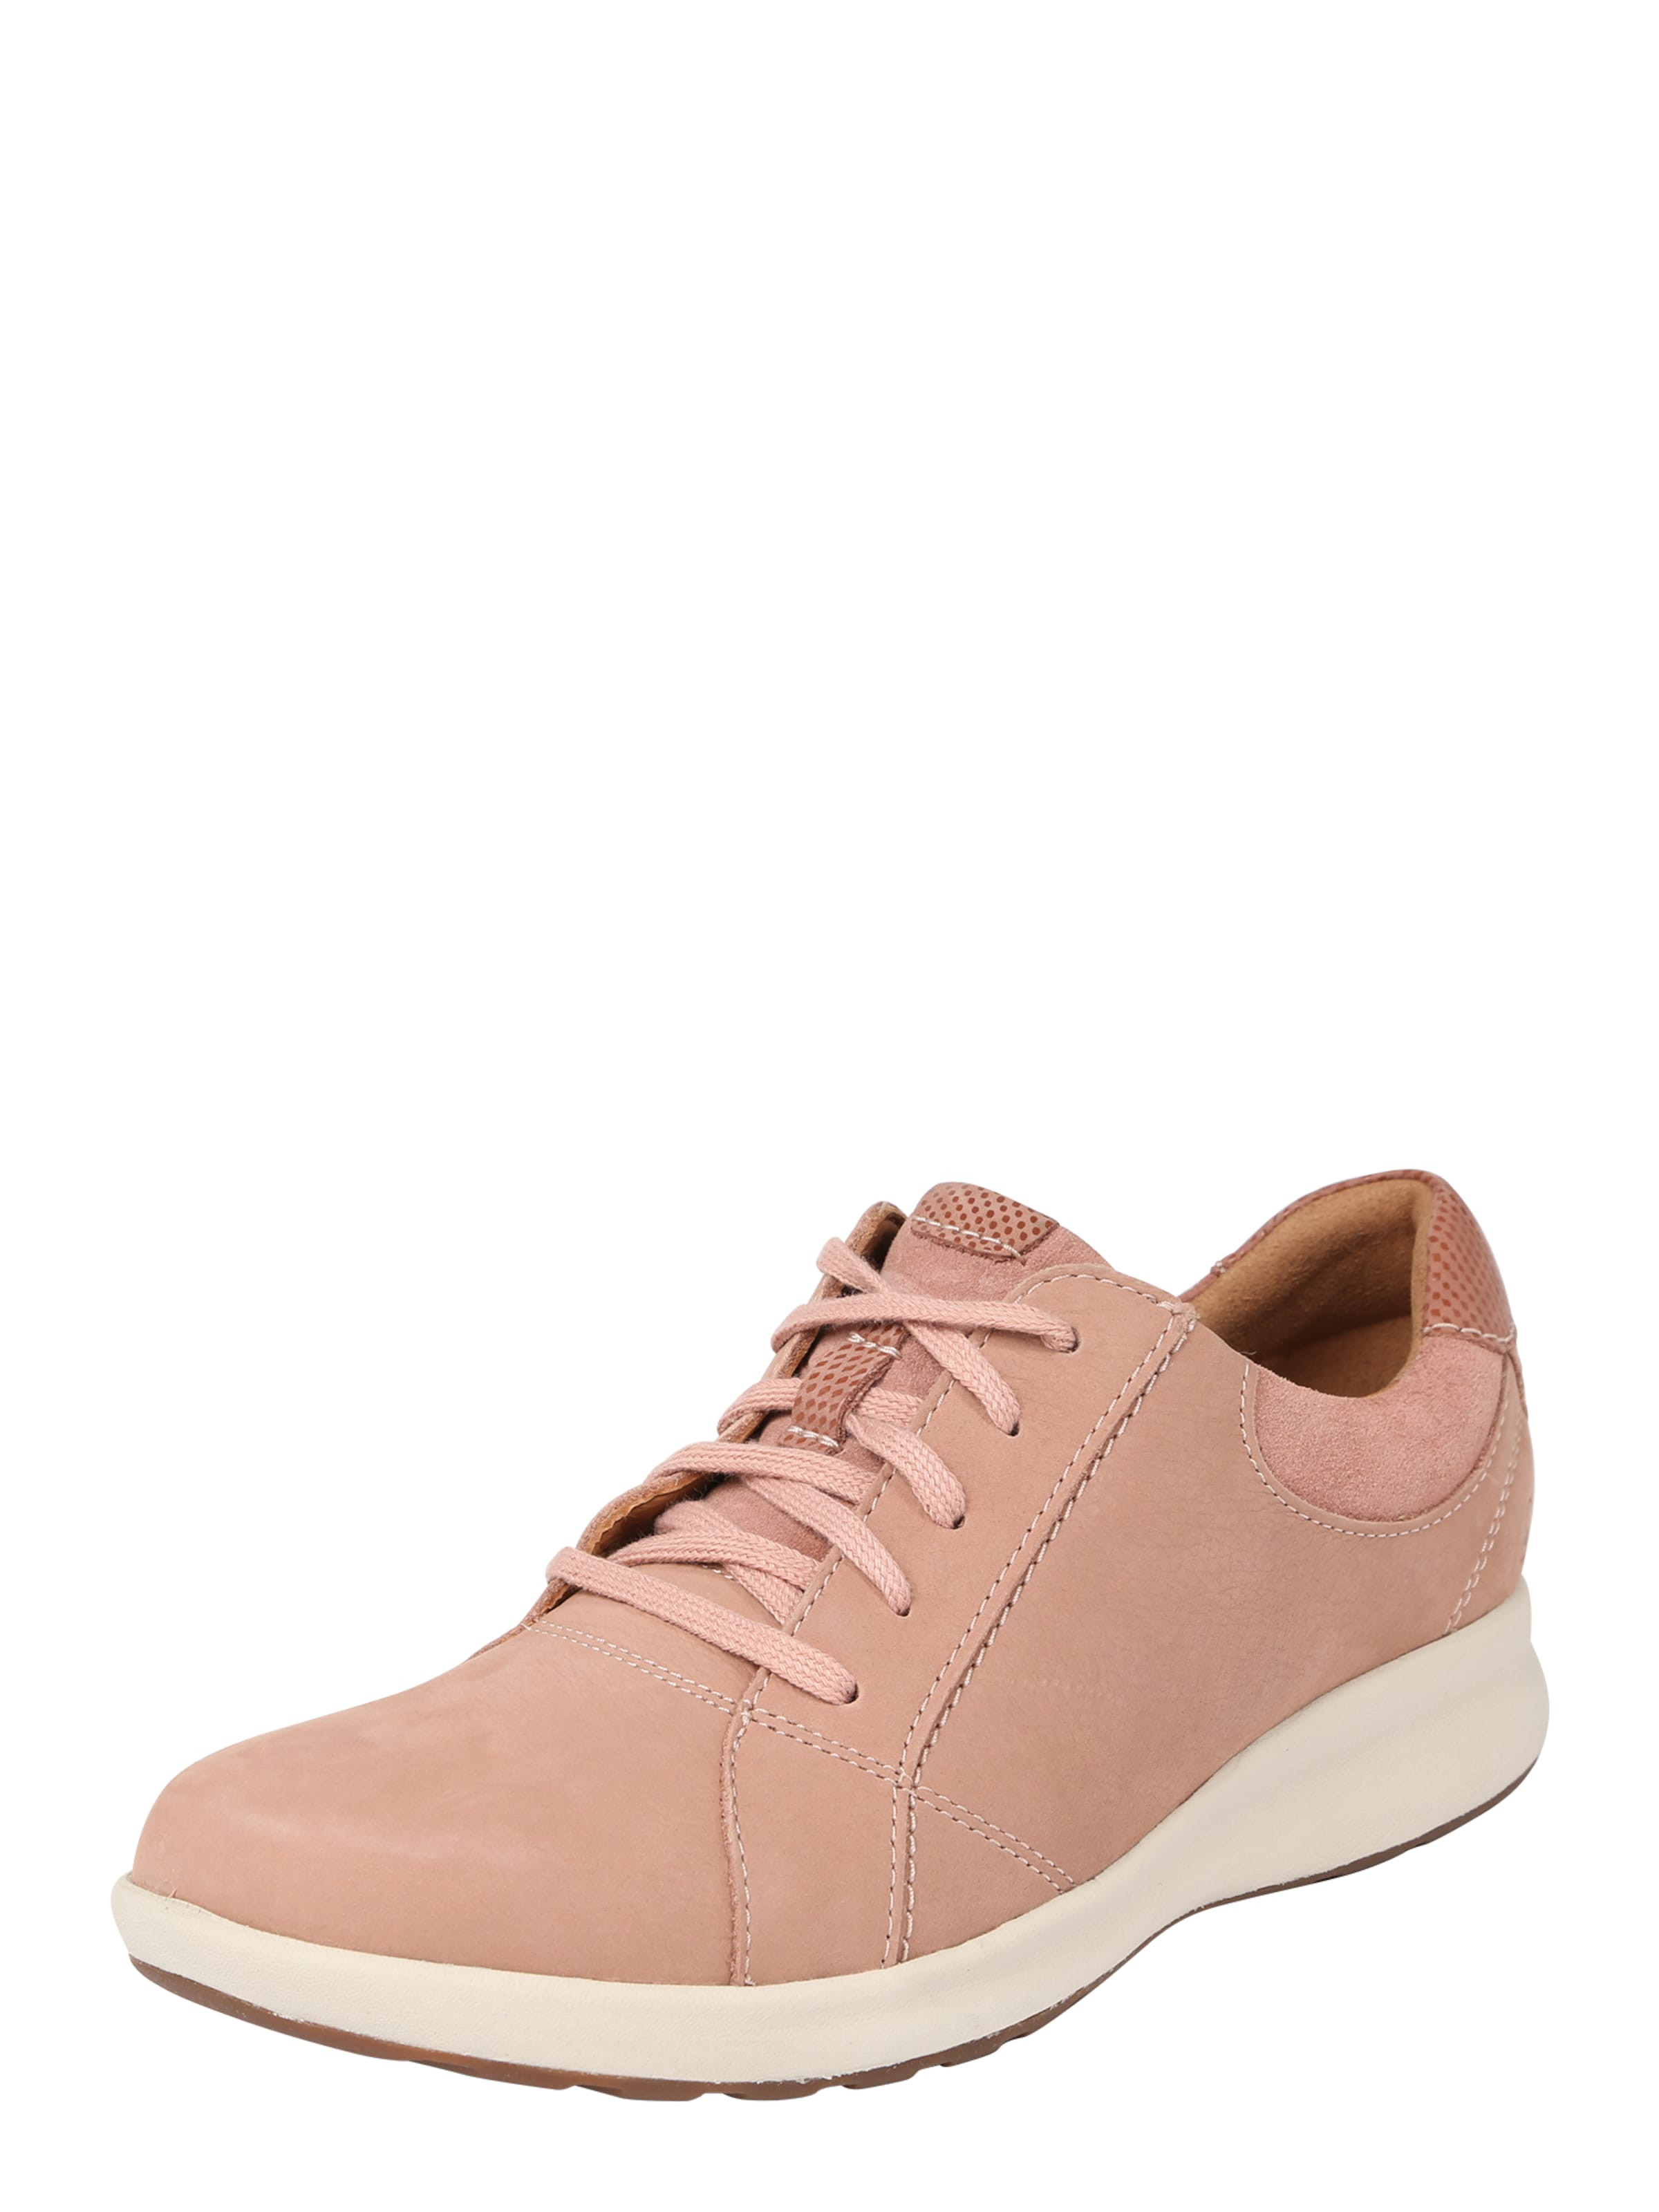 Clarks Adorn 'un Lace' In Sneaker Rosa j5ARL34